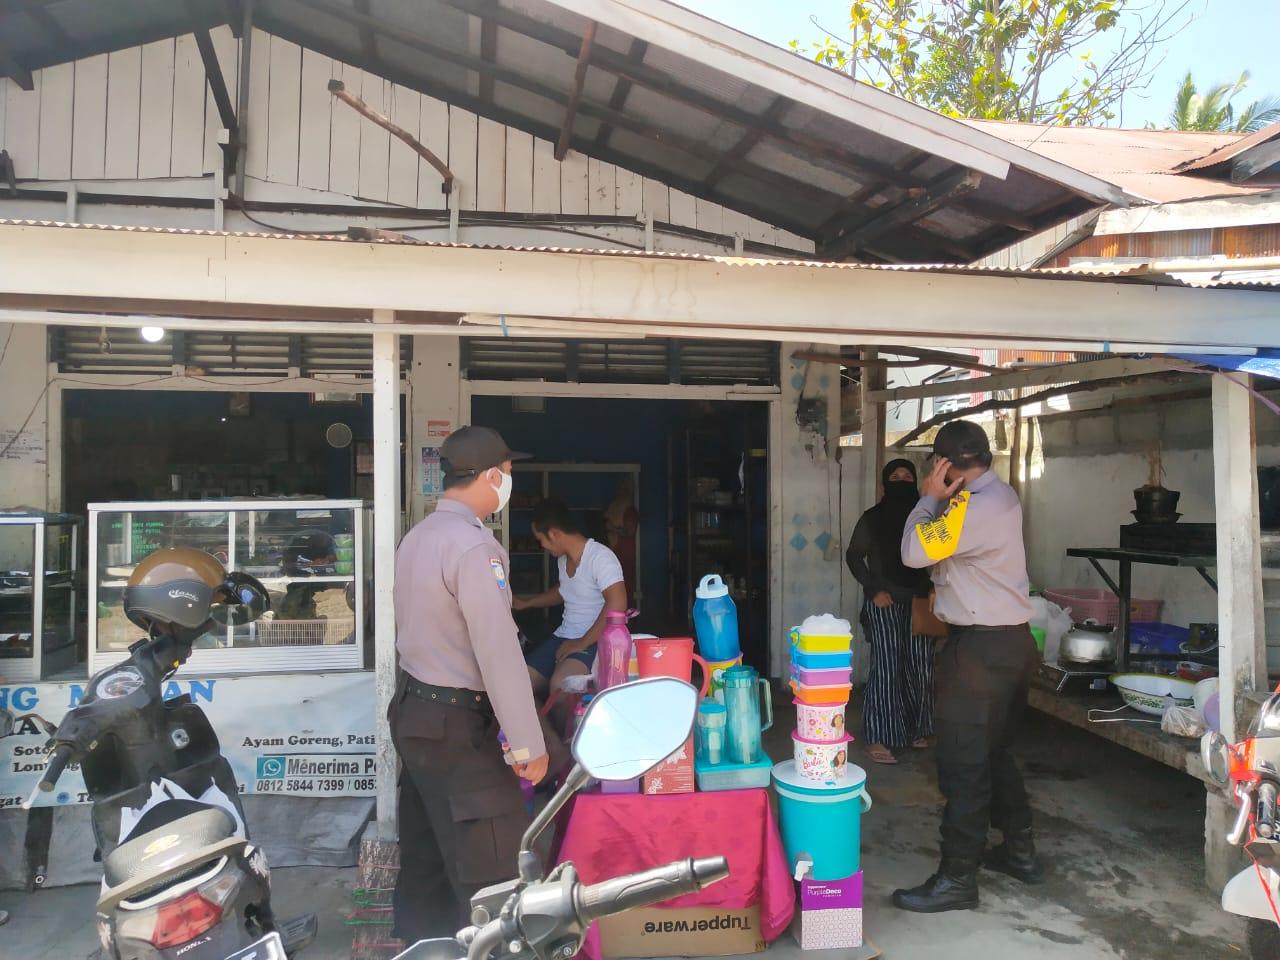 Sambangi Pasar Rakyat, Polsek Bukit Batu Imbau Masyarakat Agar Gunakan Masker